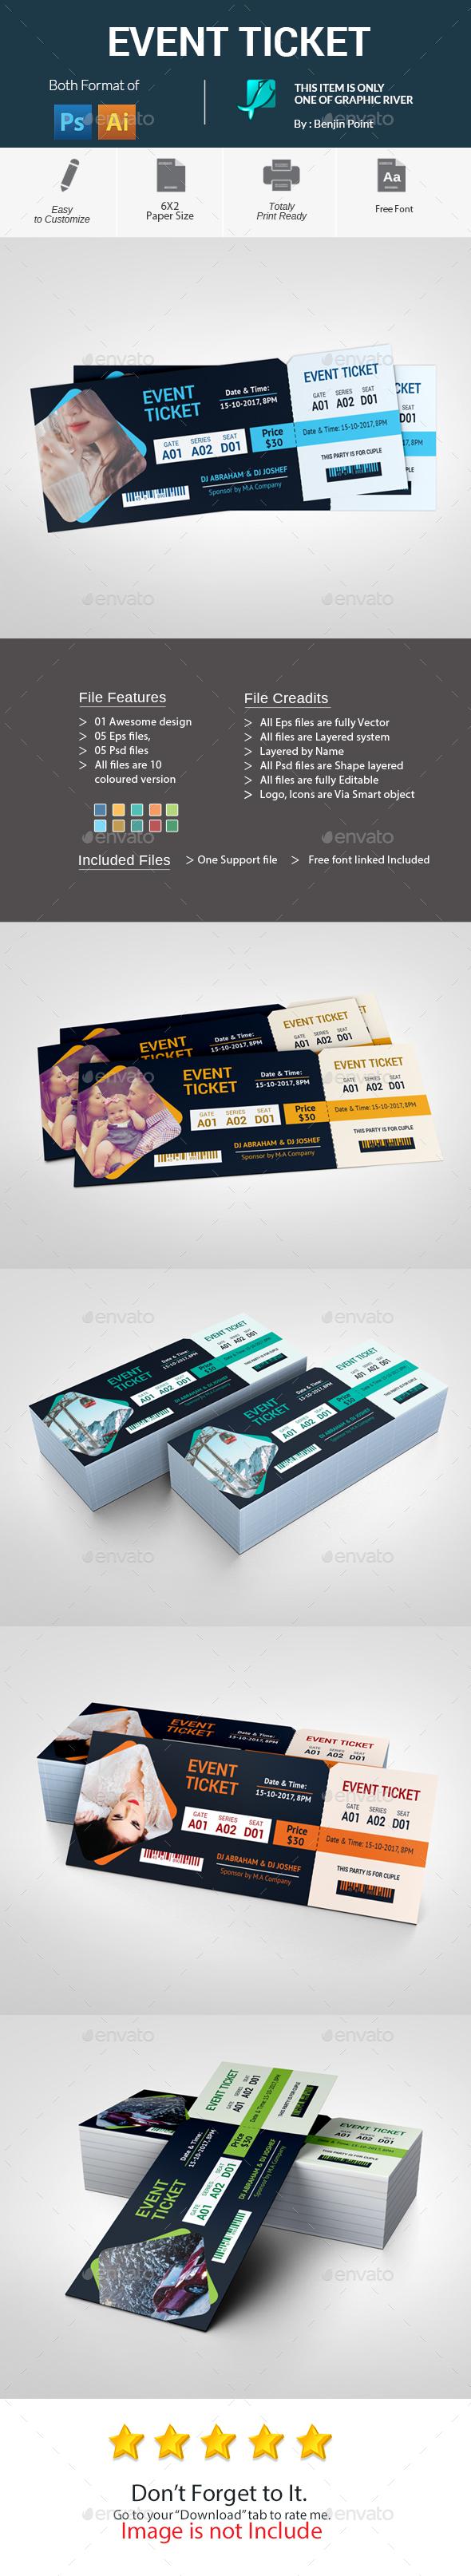 GraphicRiver Event Ticket 20762620